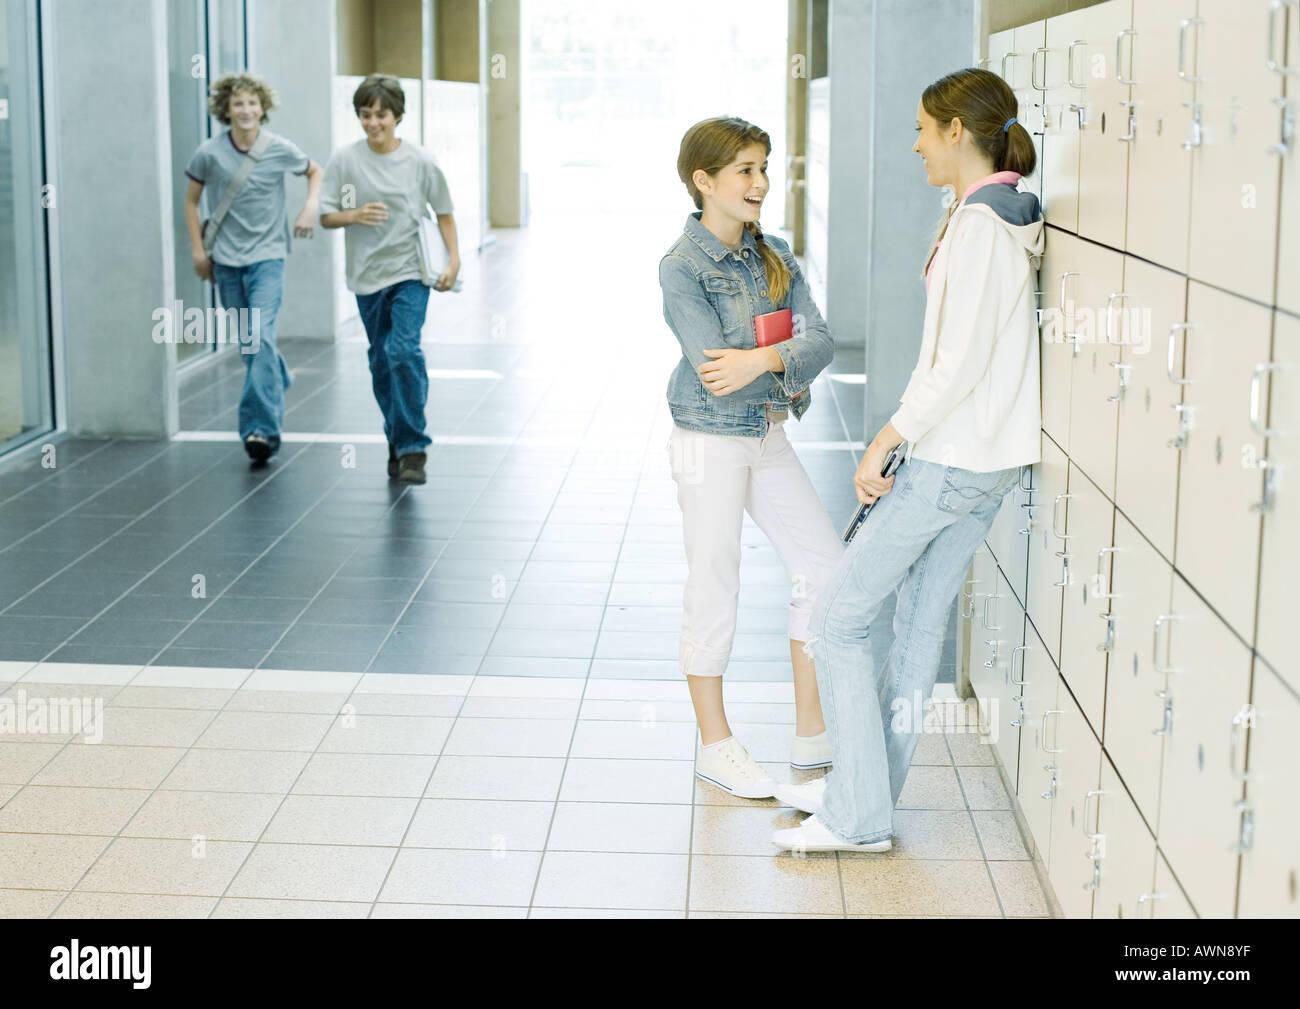 Two teen girls talking by lockers while boys run through hallway - Stock Image